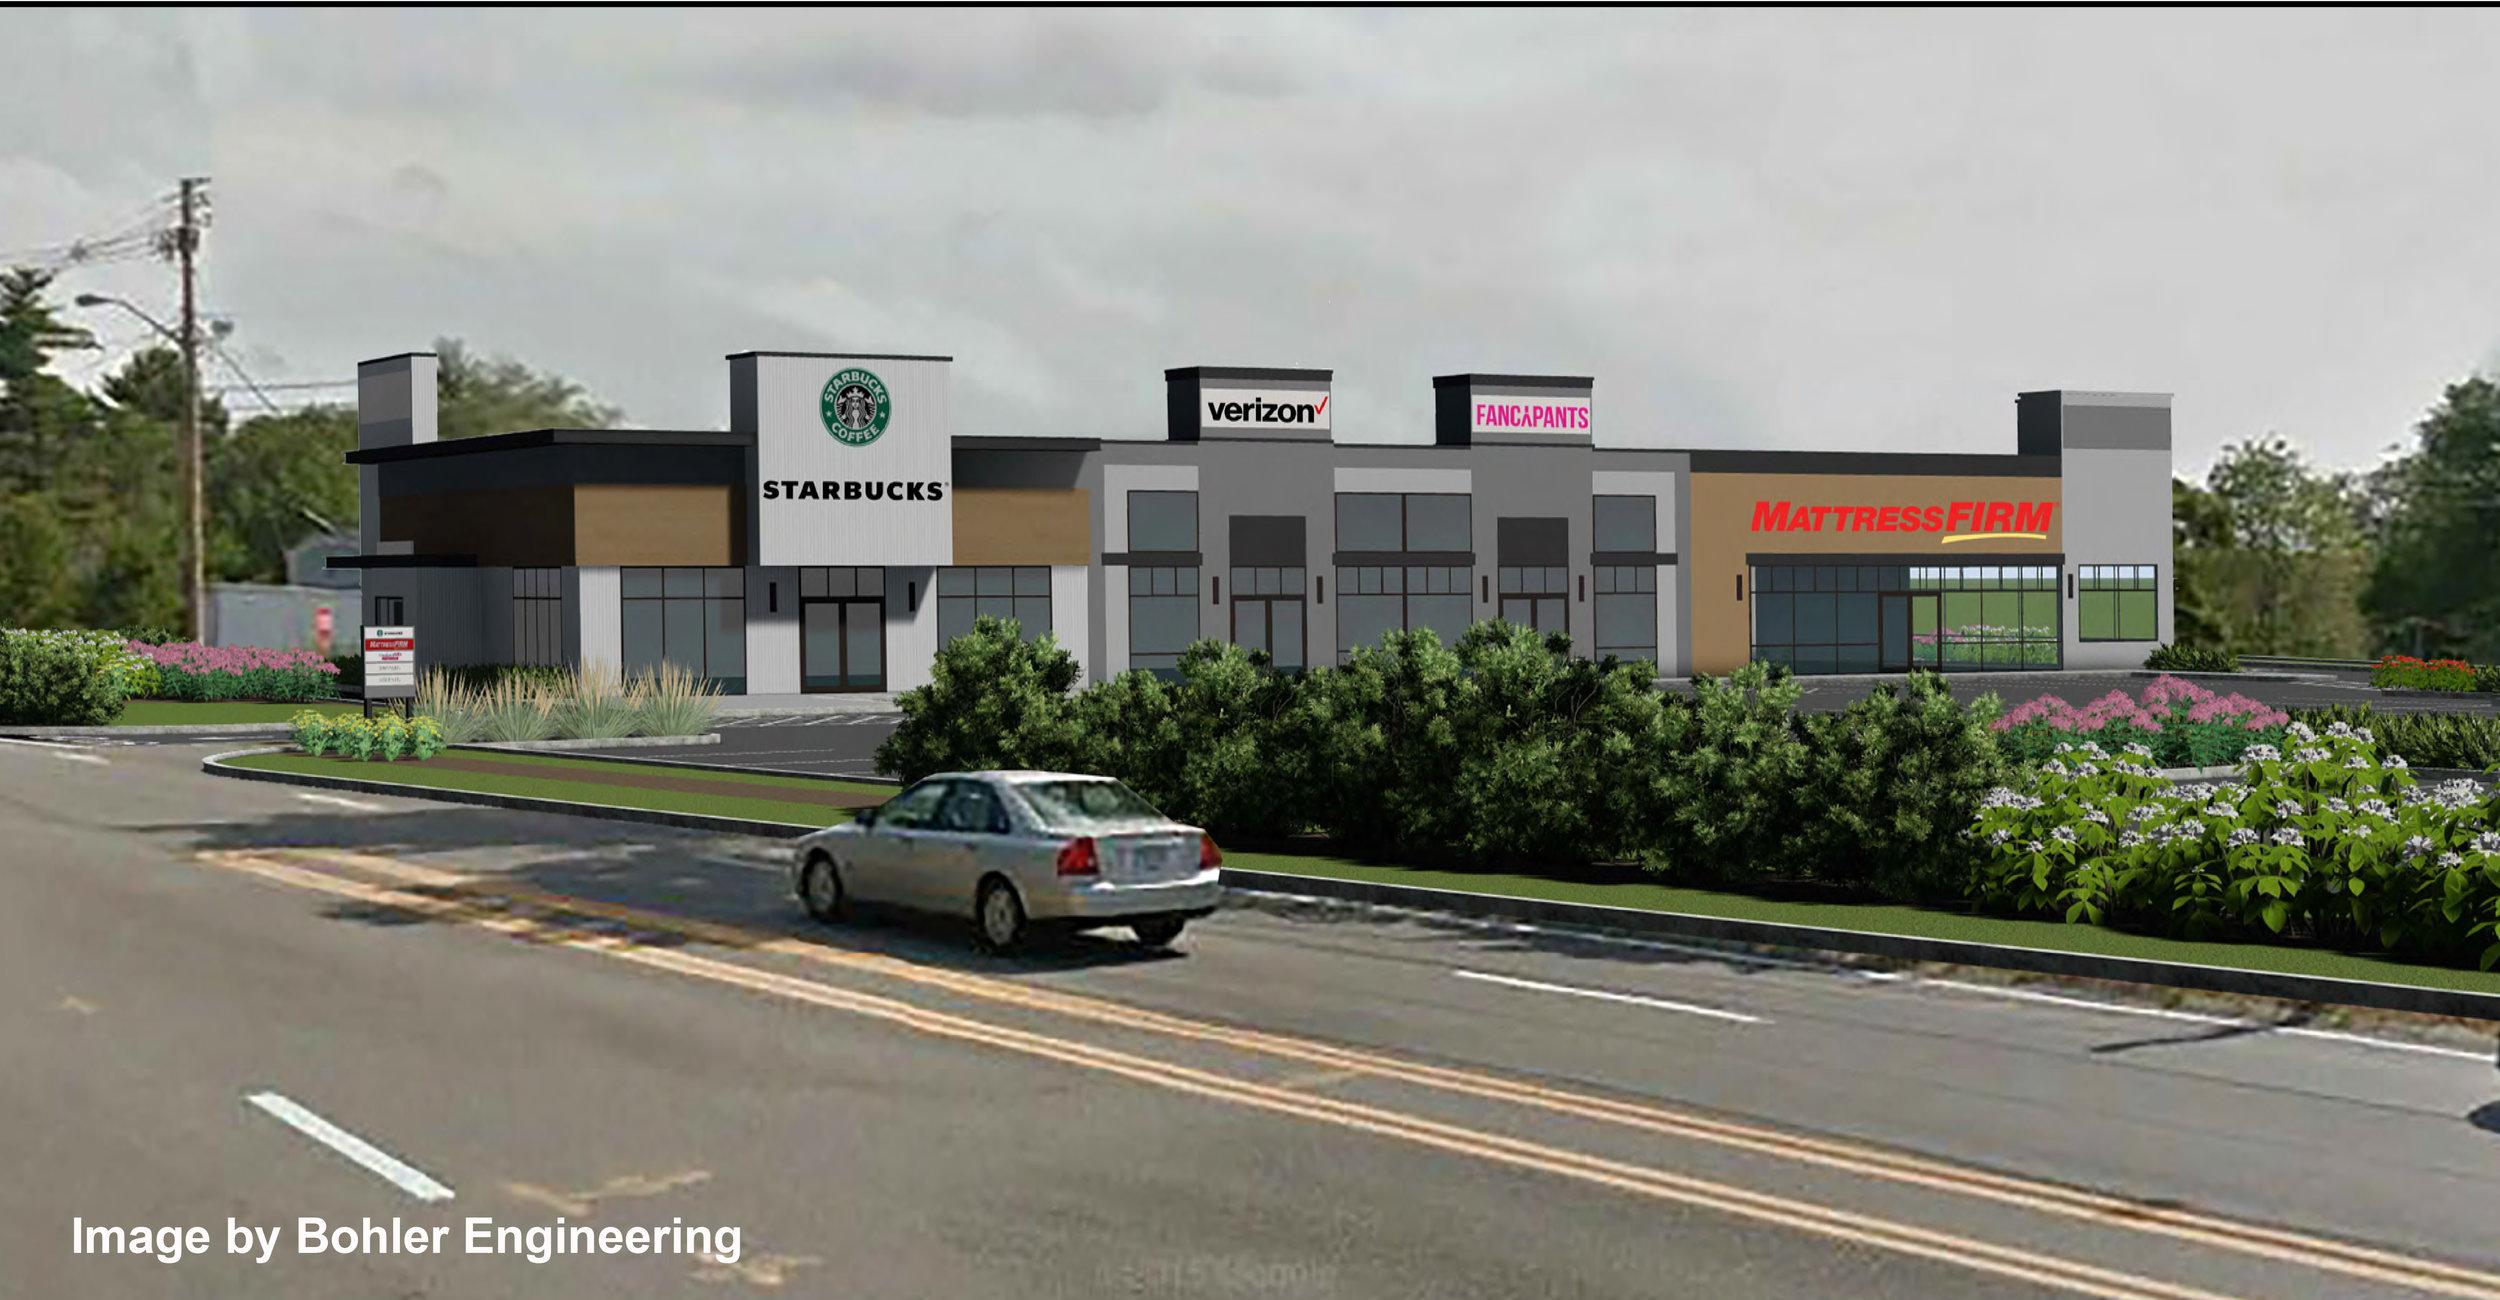 Plainville Ma Retail Center.jpg